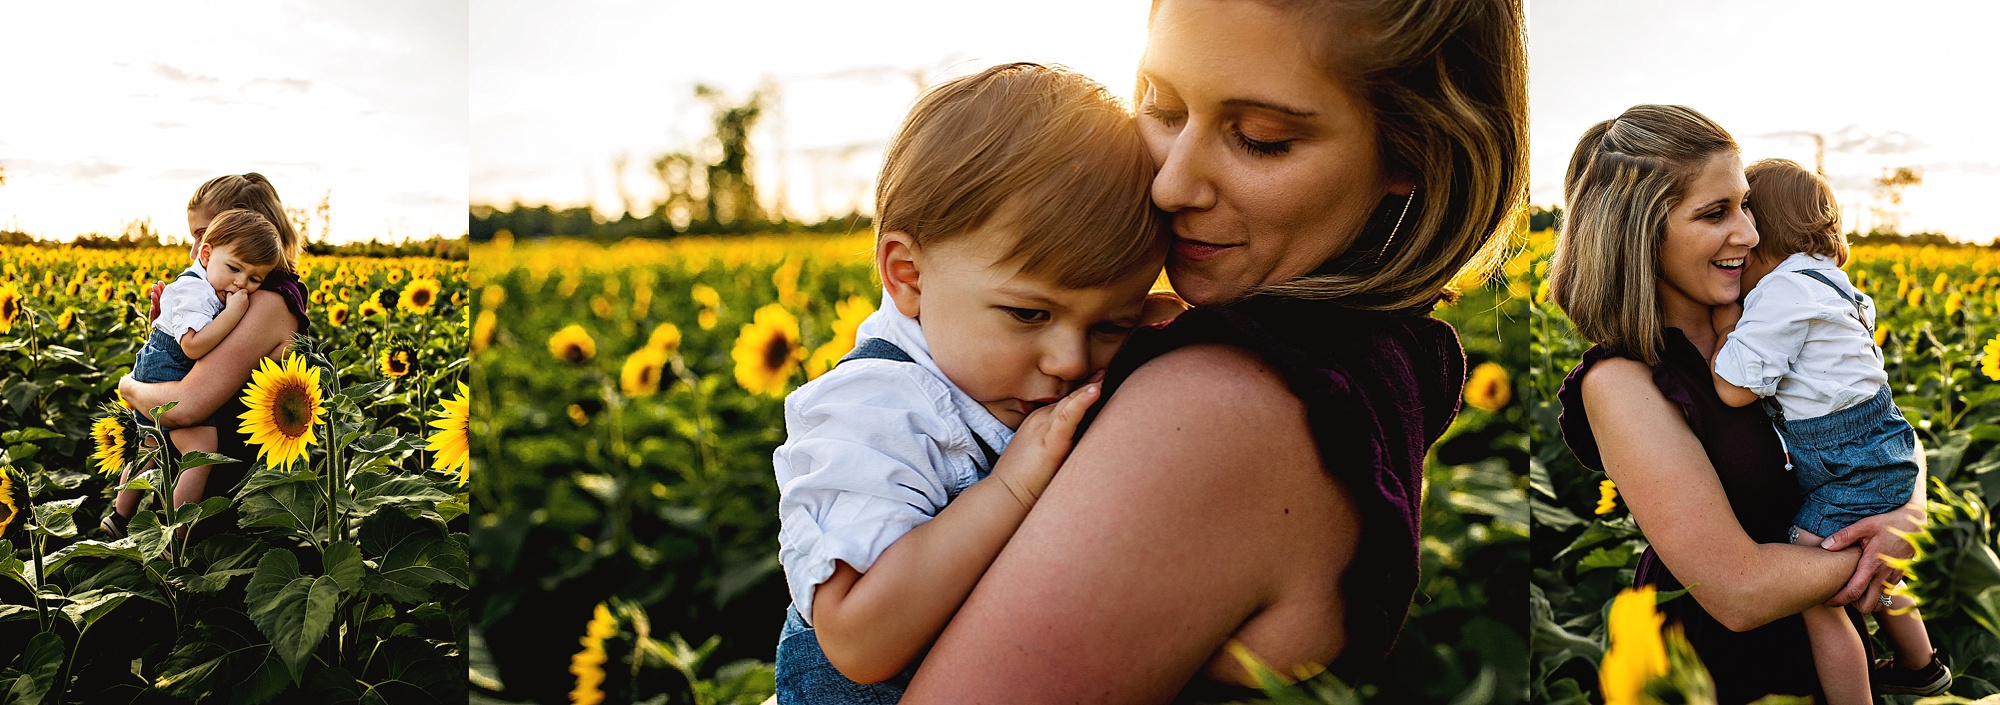 Schreiner-family-lauren-grayson-cleveland-photographer-sunflower-field-session_0004.jpg